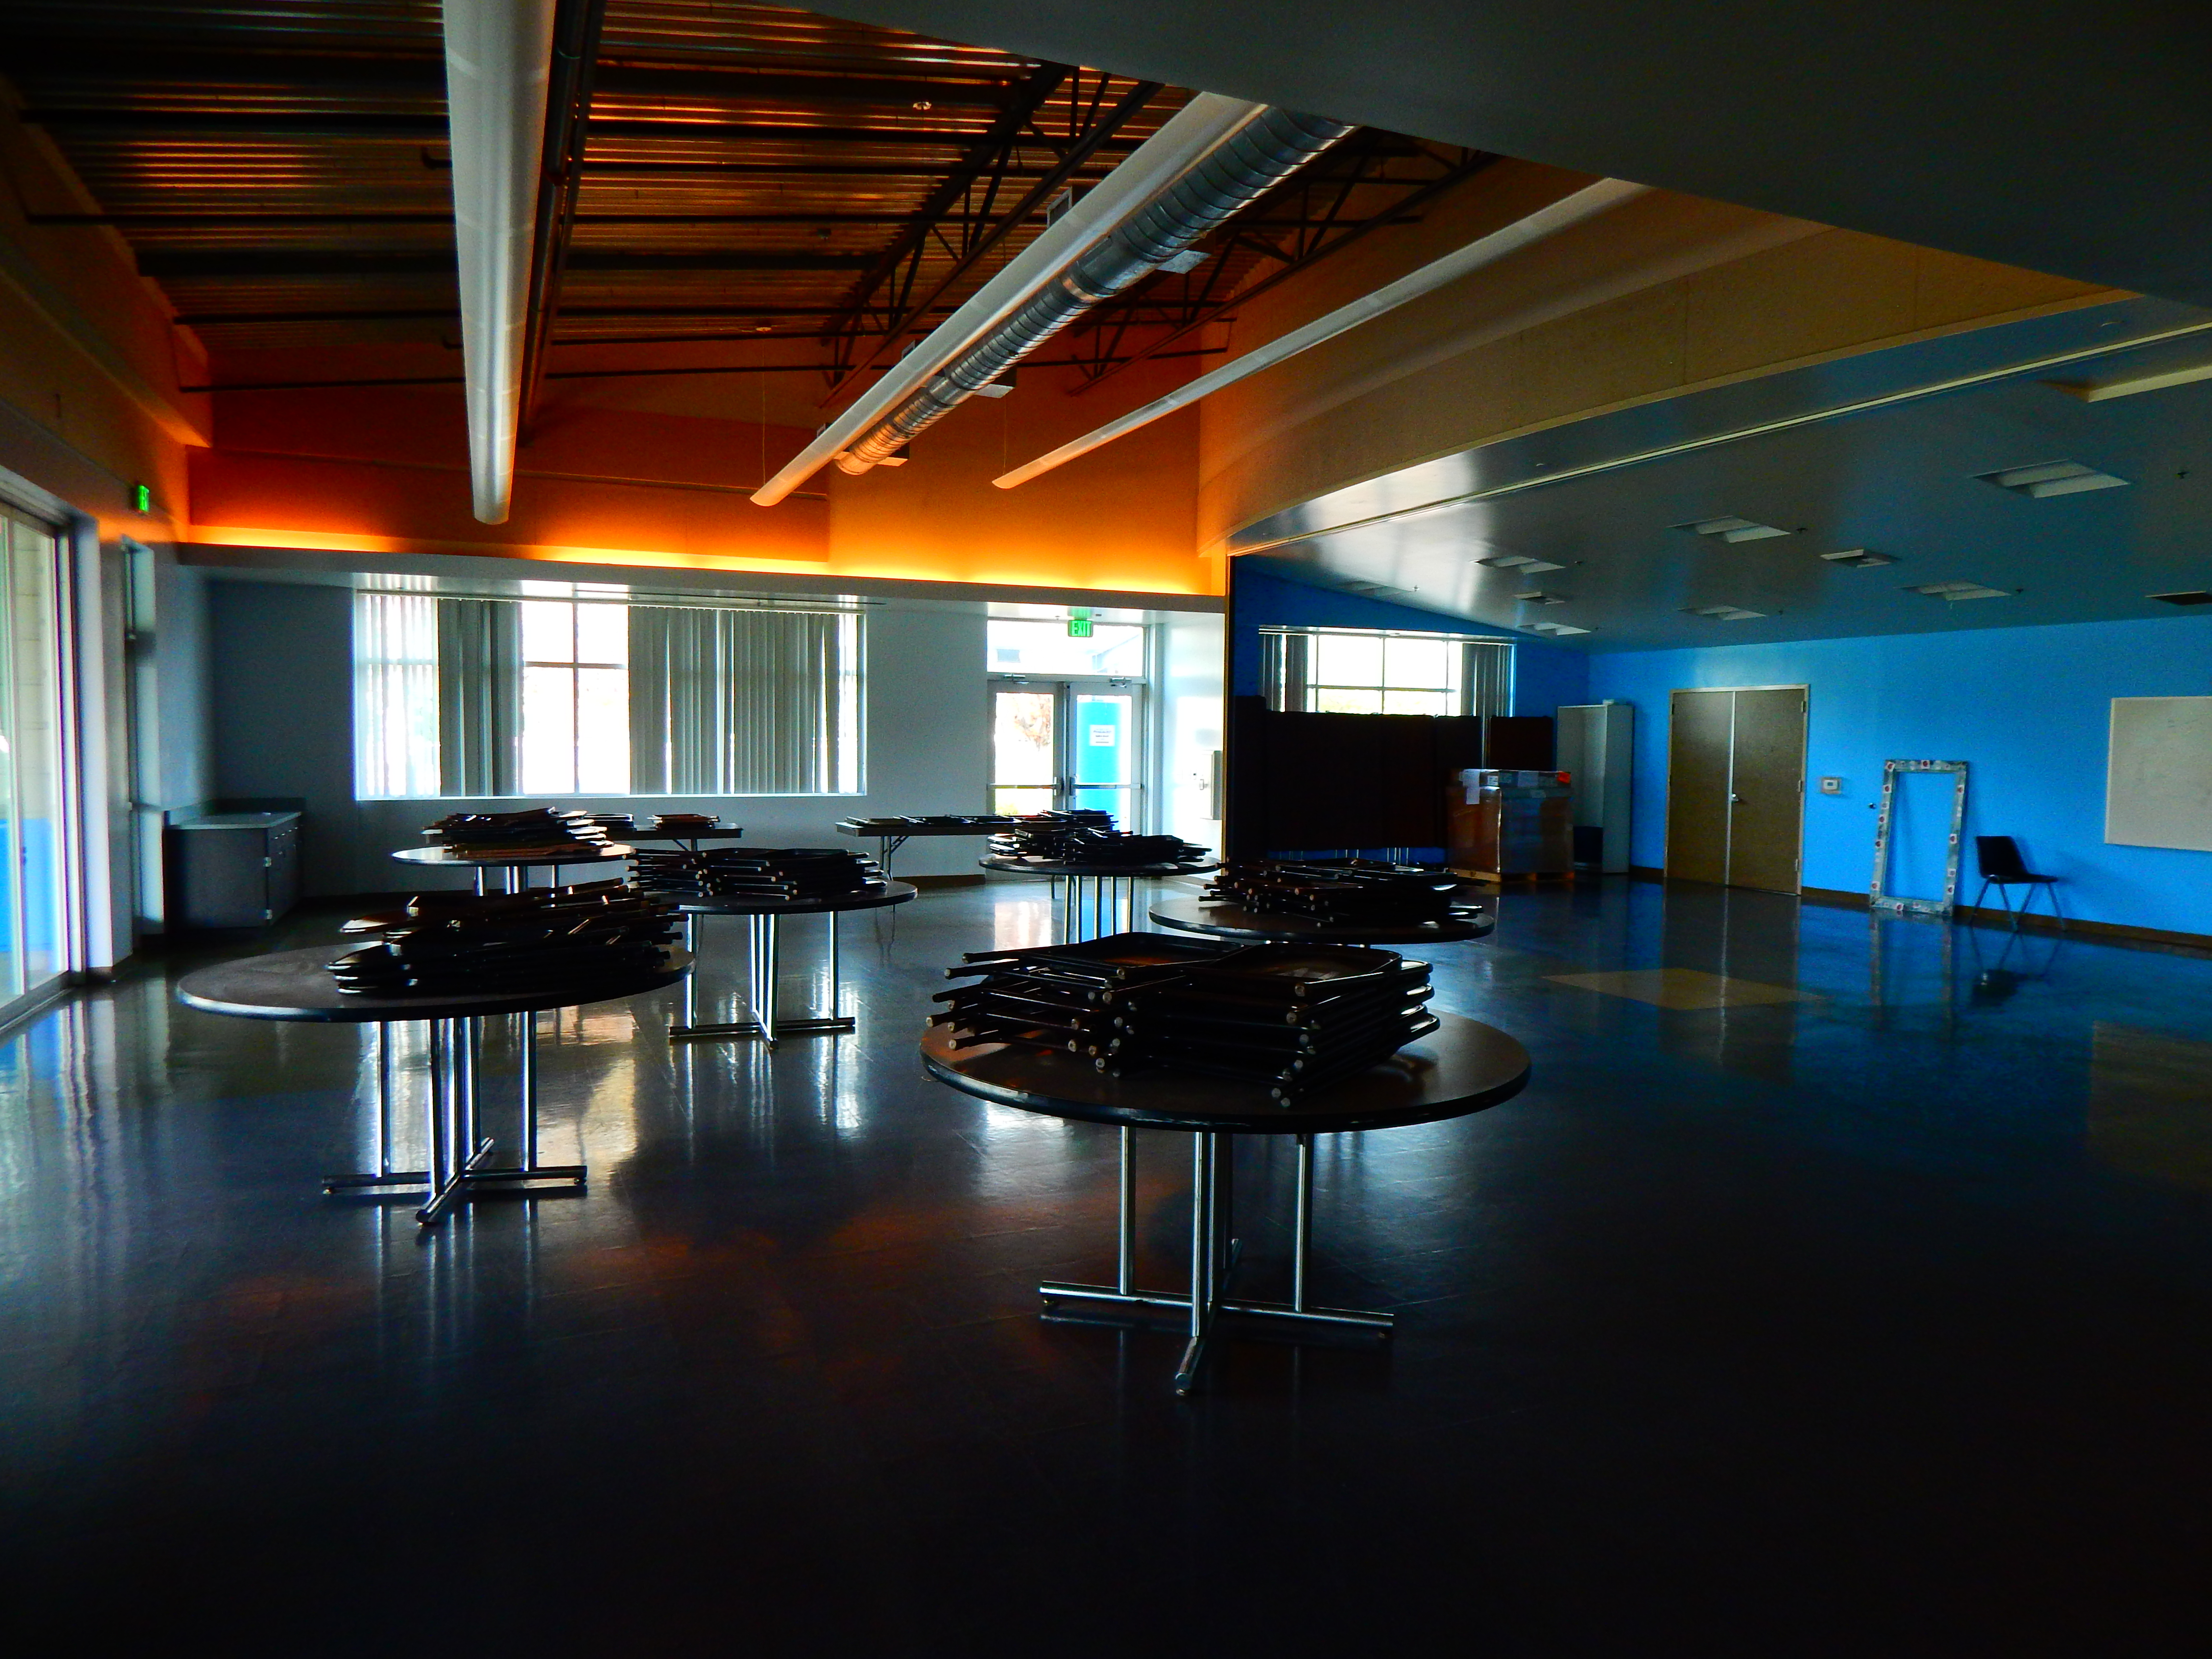 Teichert Multi Purpose Room